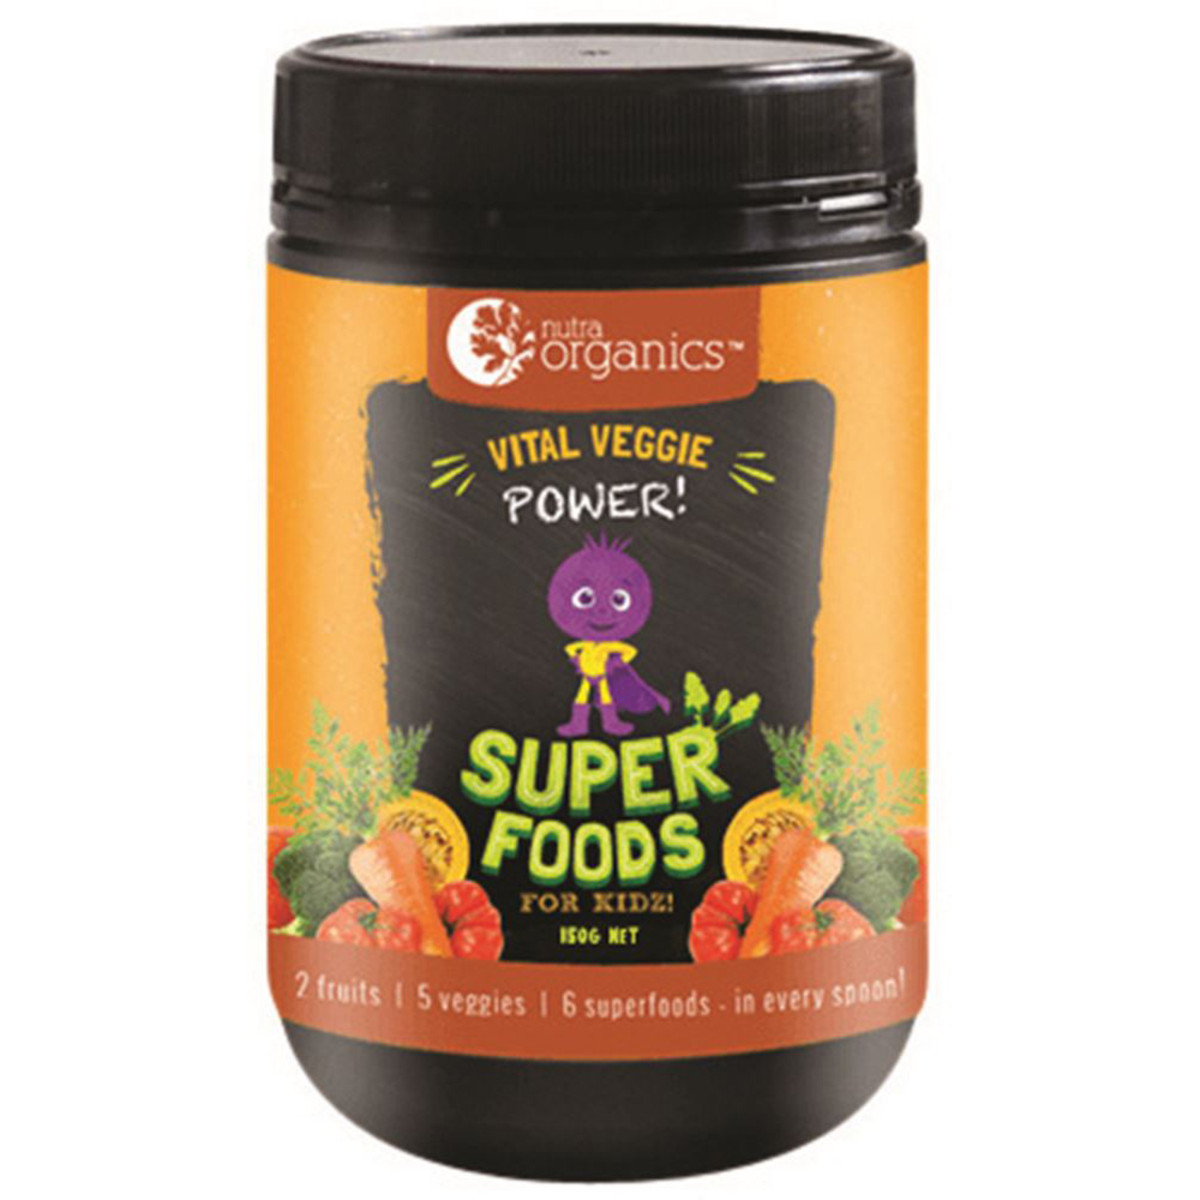 Nutra Organics Vital Veggie Powder